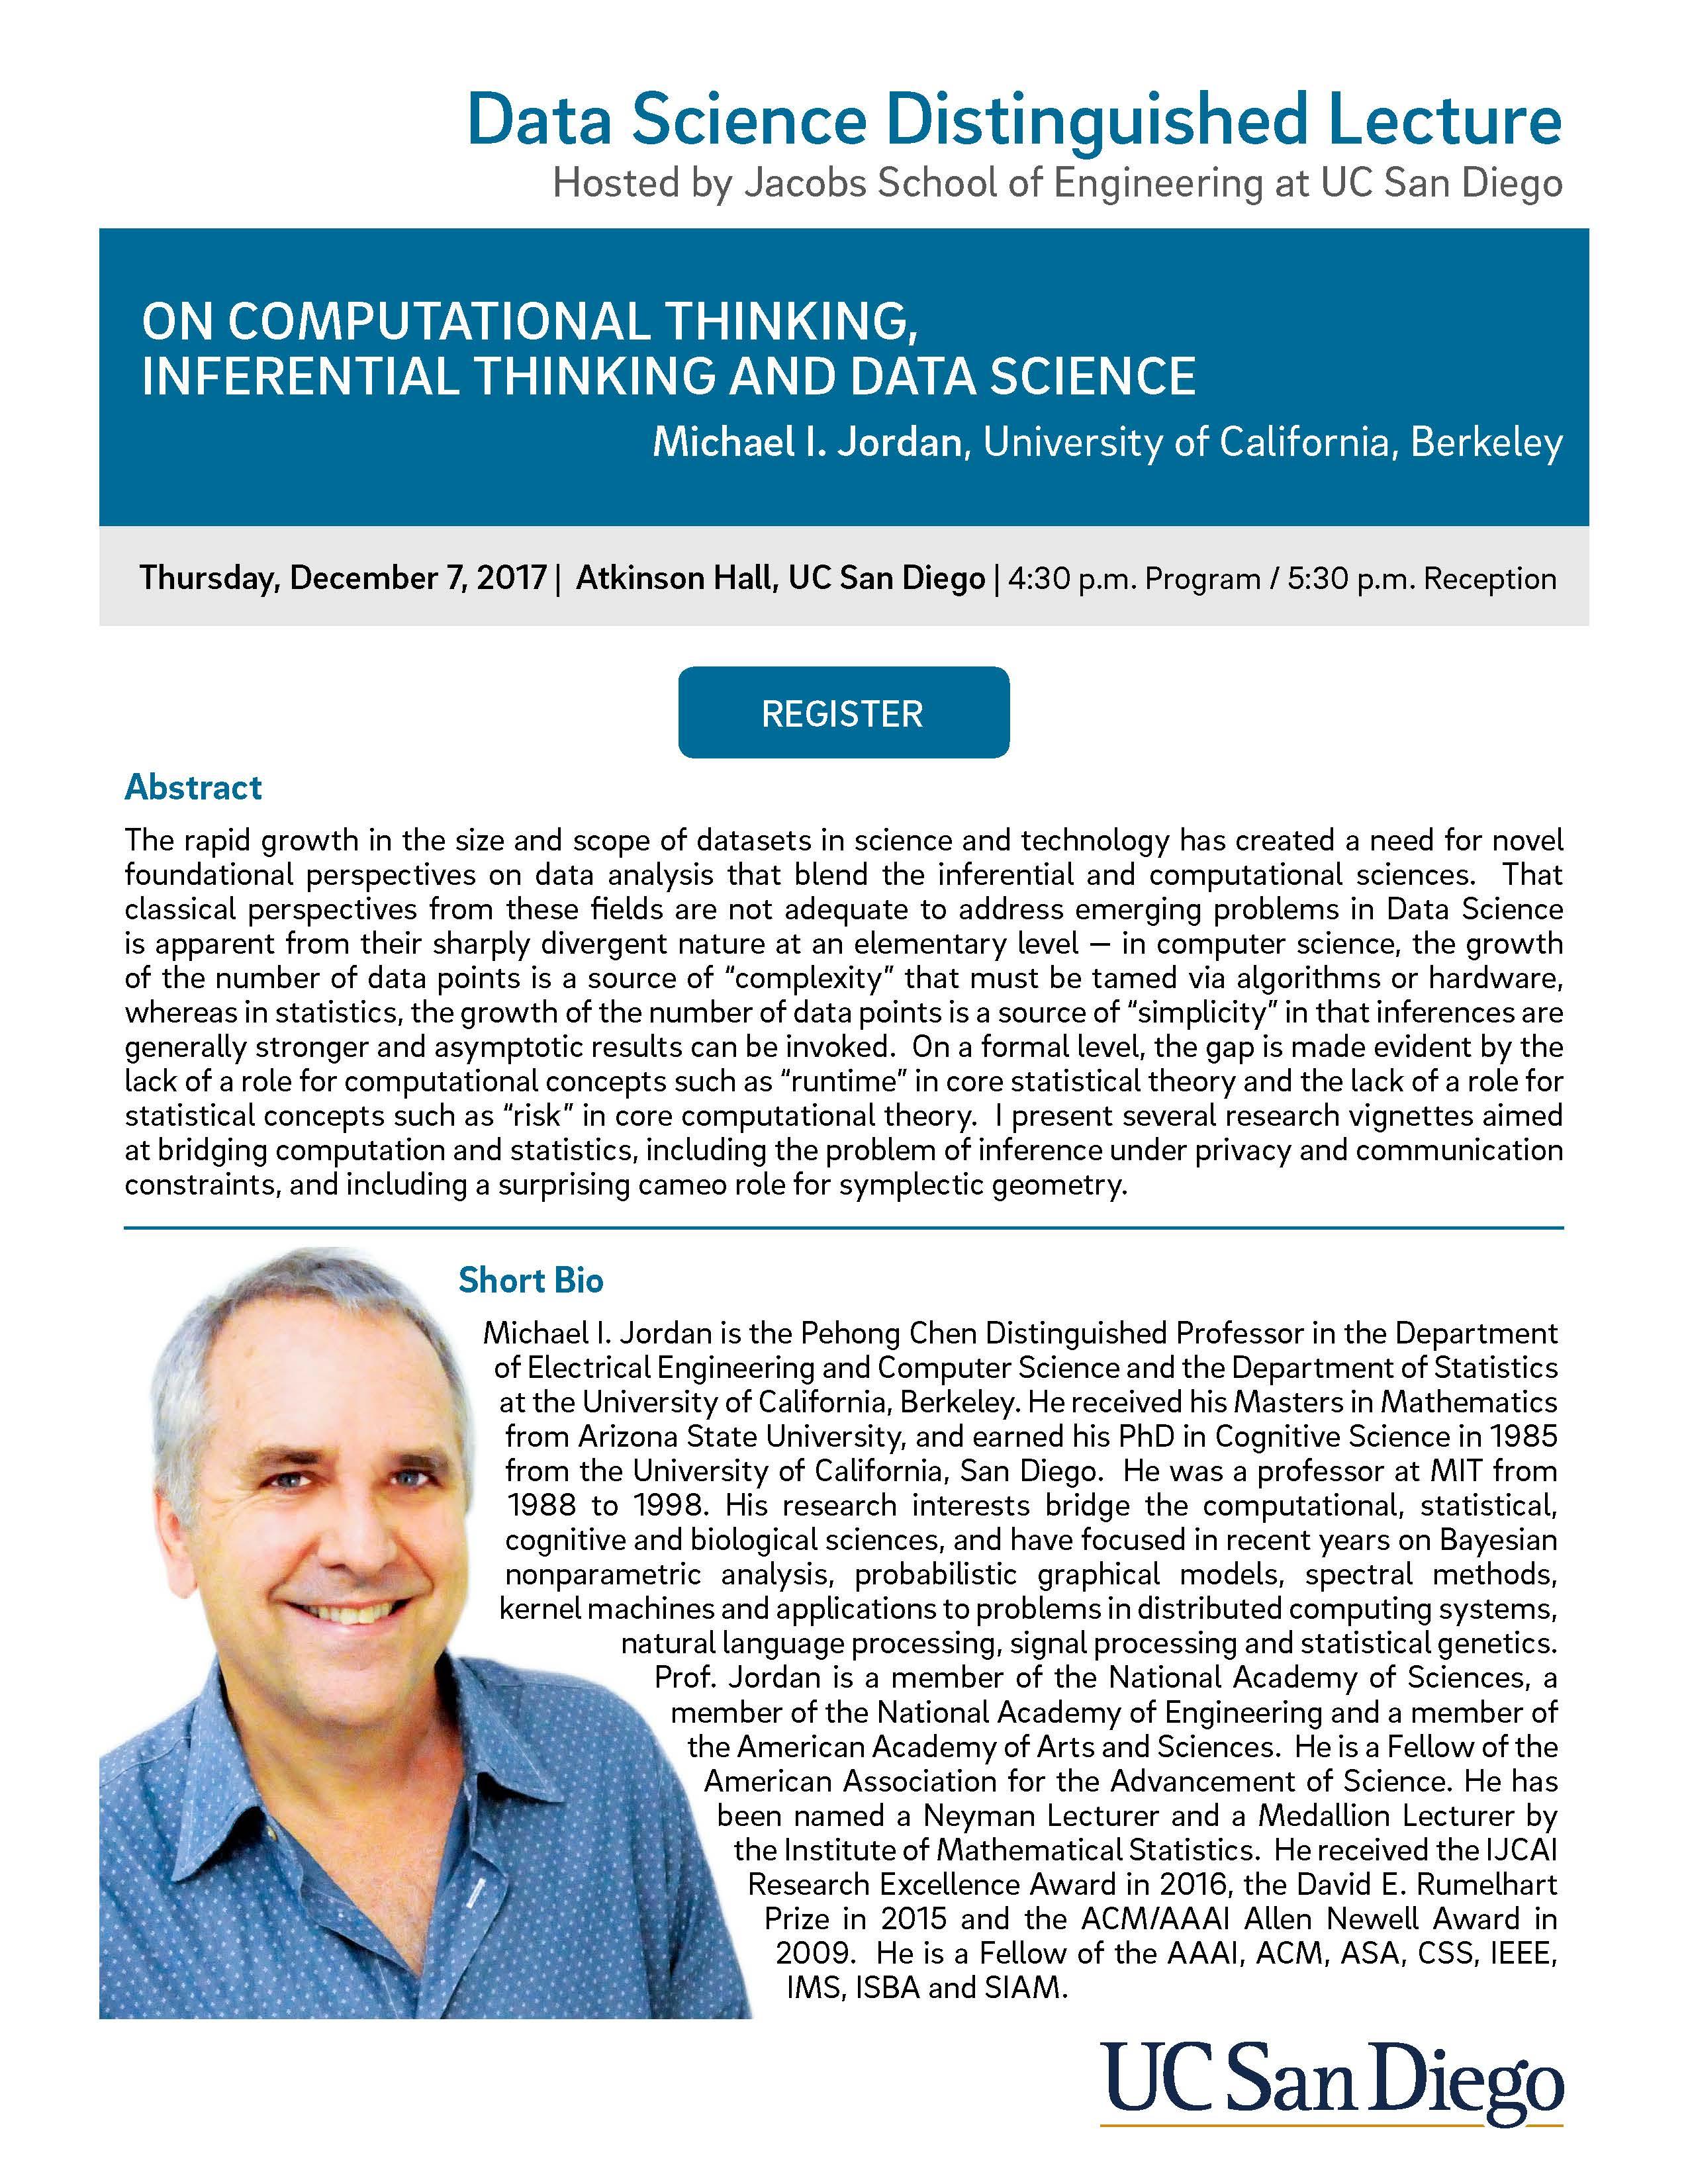 Invitation_MichaelJordan_Data Sci Distinguished Lecture Series.jpg